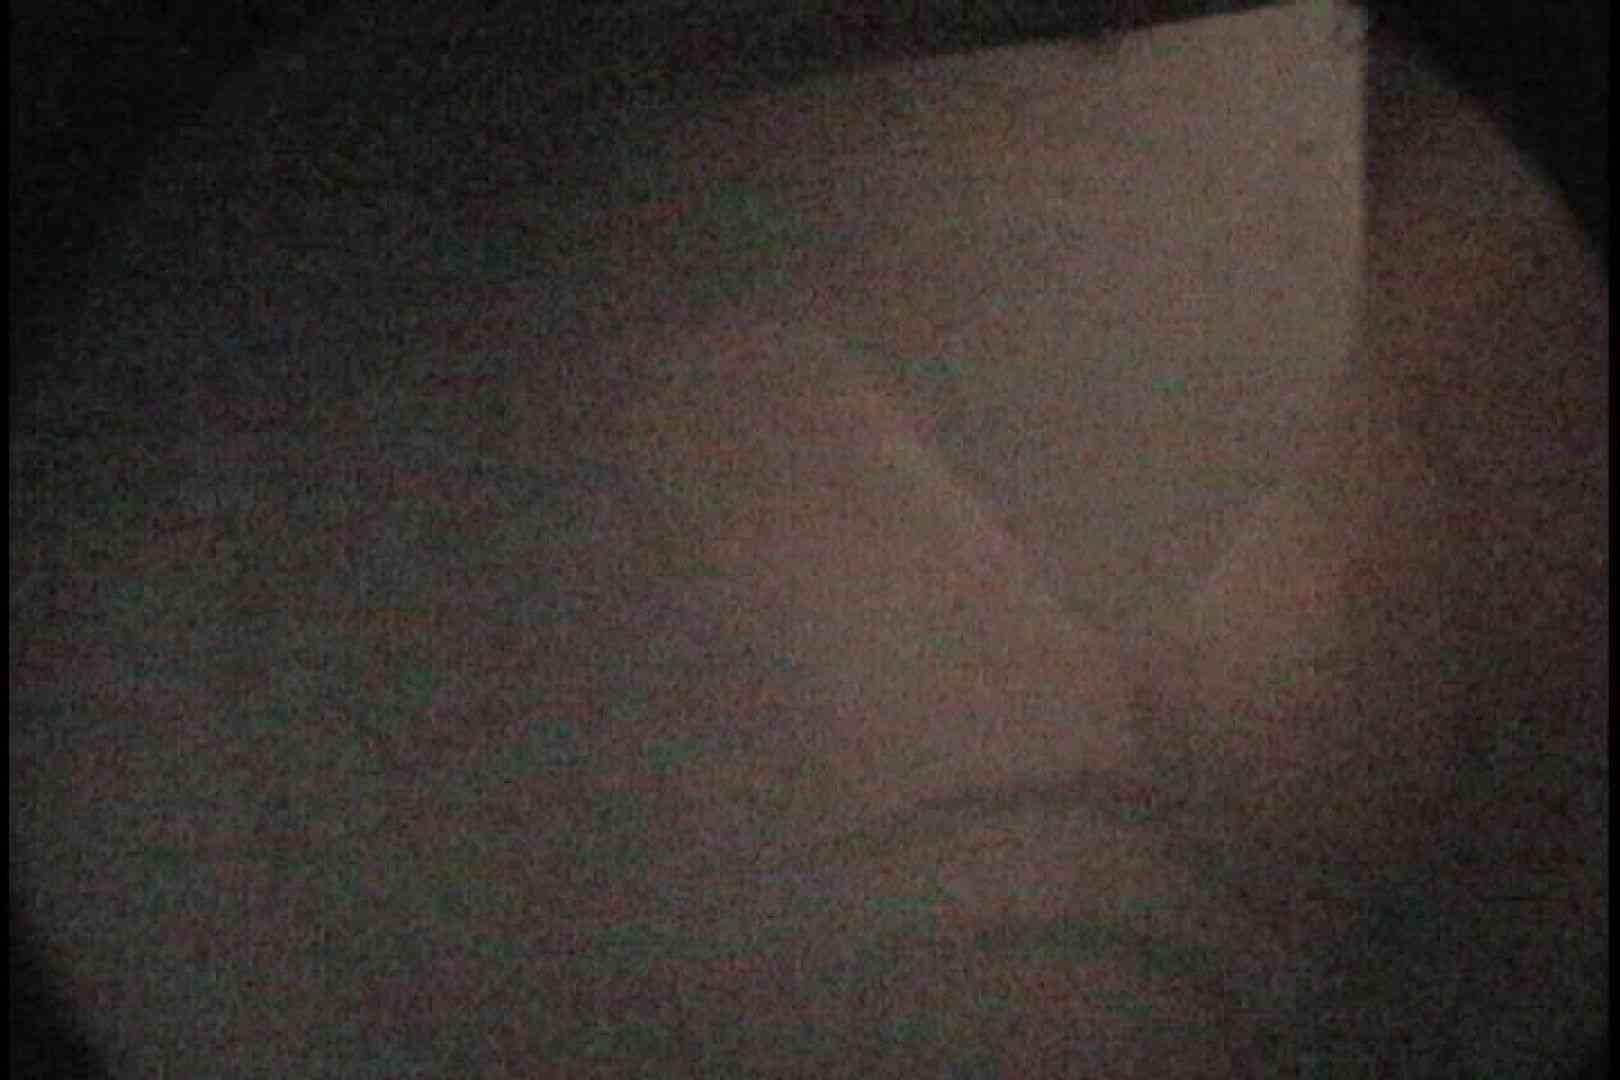 No.111  カメラに向けられる鋭い視線が! シャワー室  101枚 84